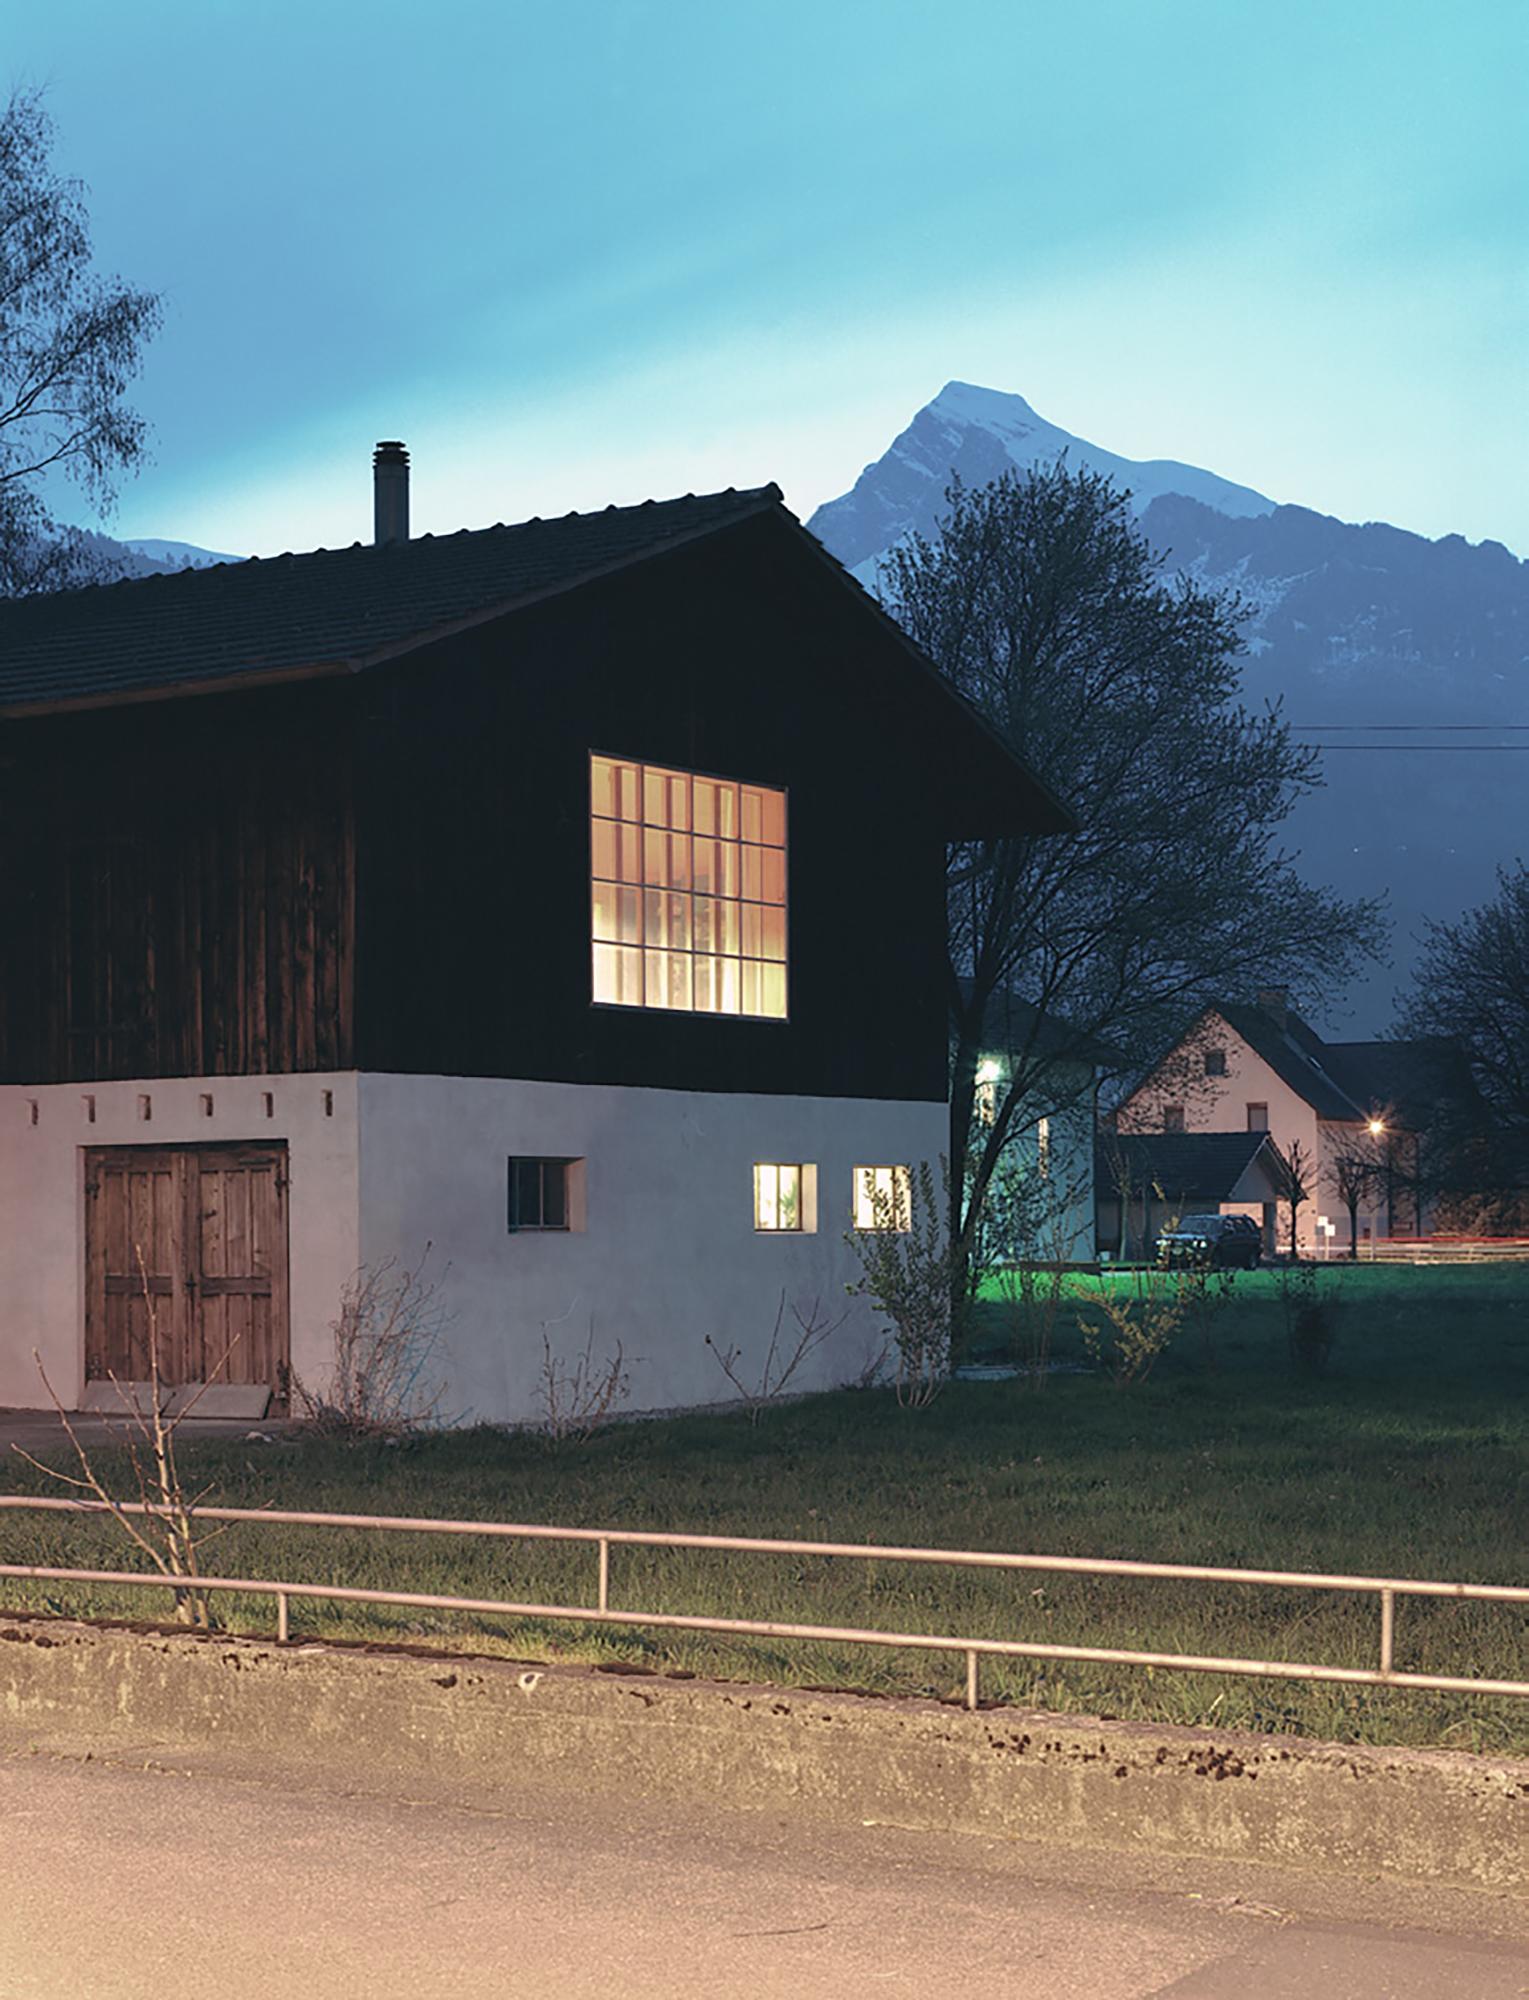 Atelier Vogt